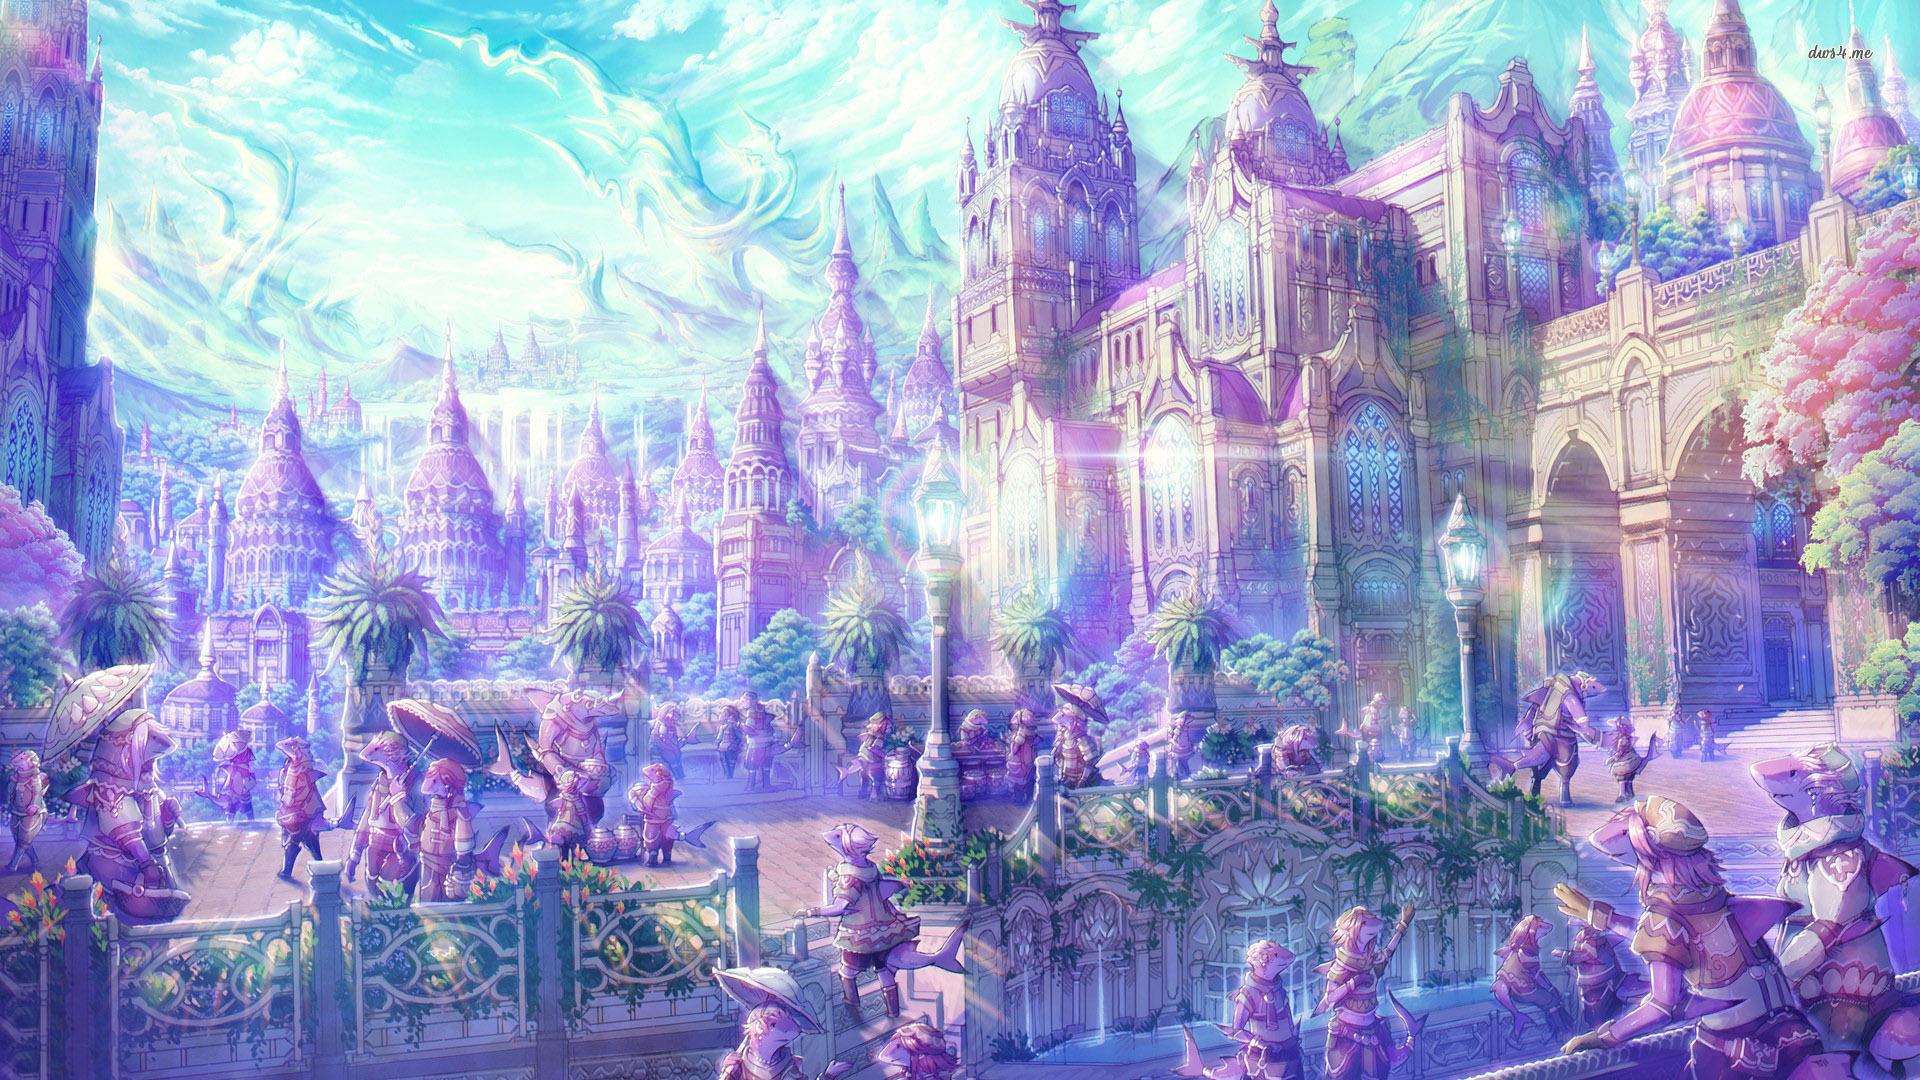 Anime kingdom wallpaper 1280x800 Anime kingdom wallpaper 1366x768 1920x1080